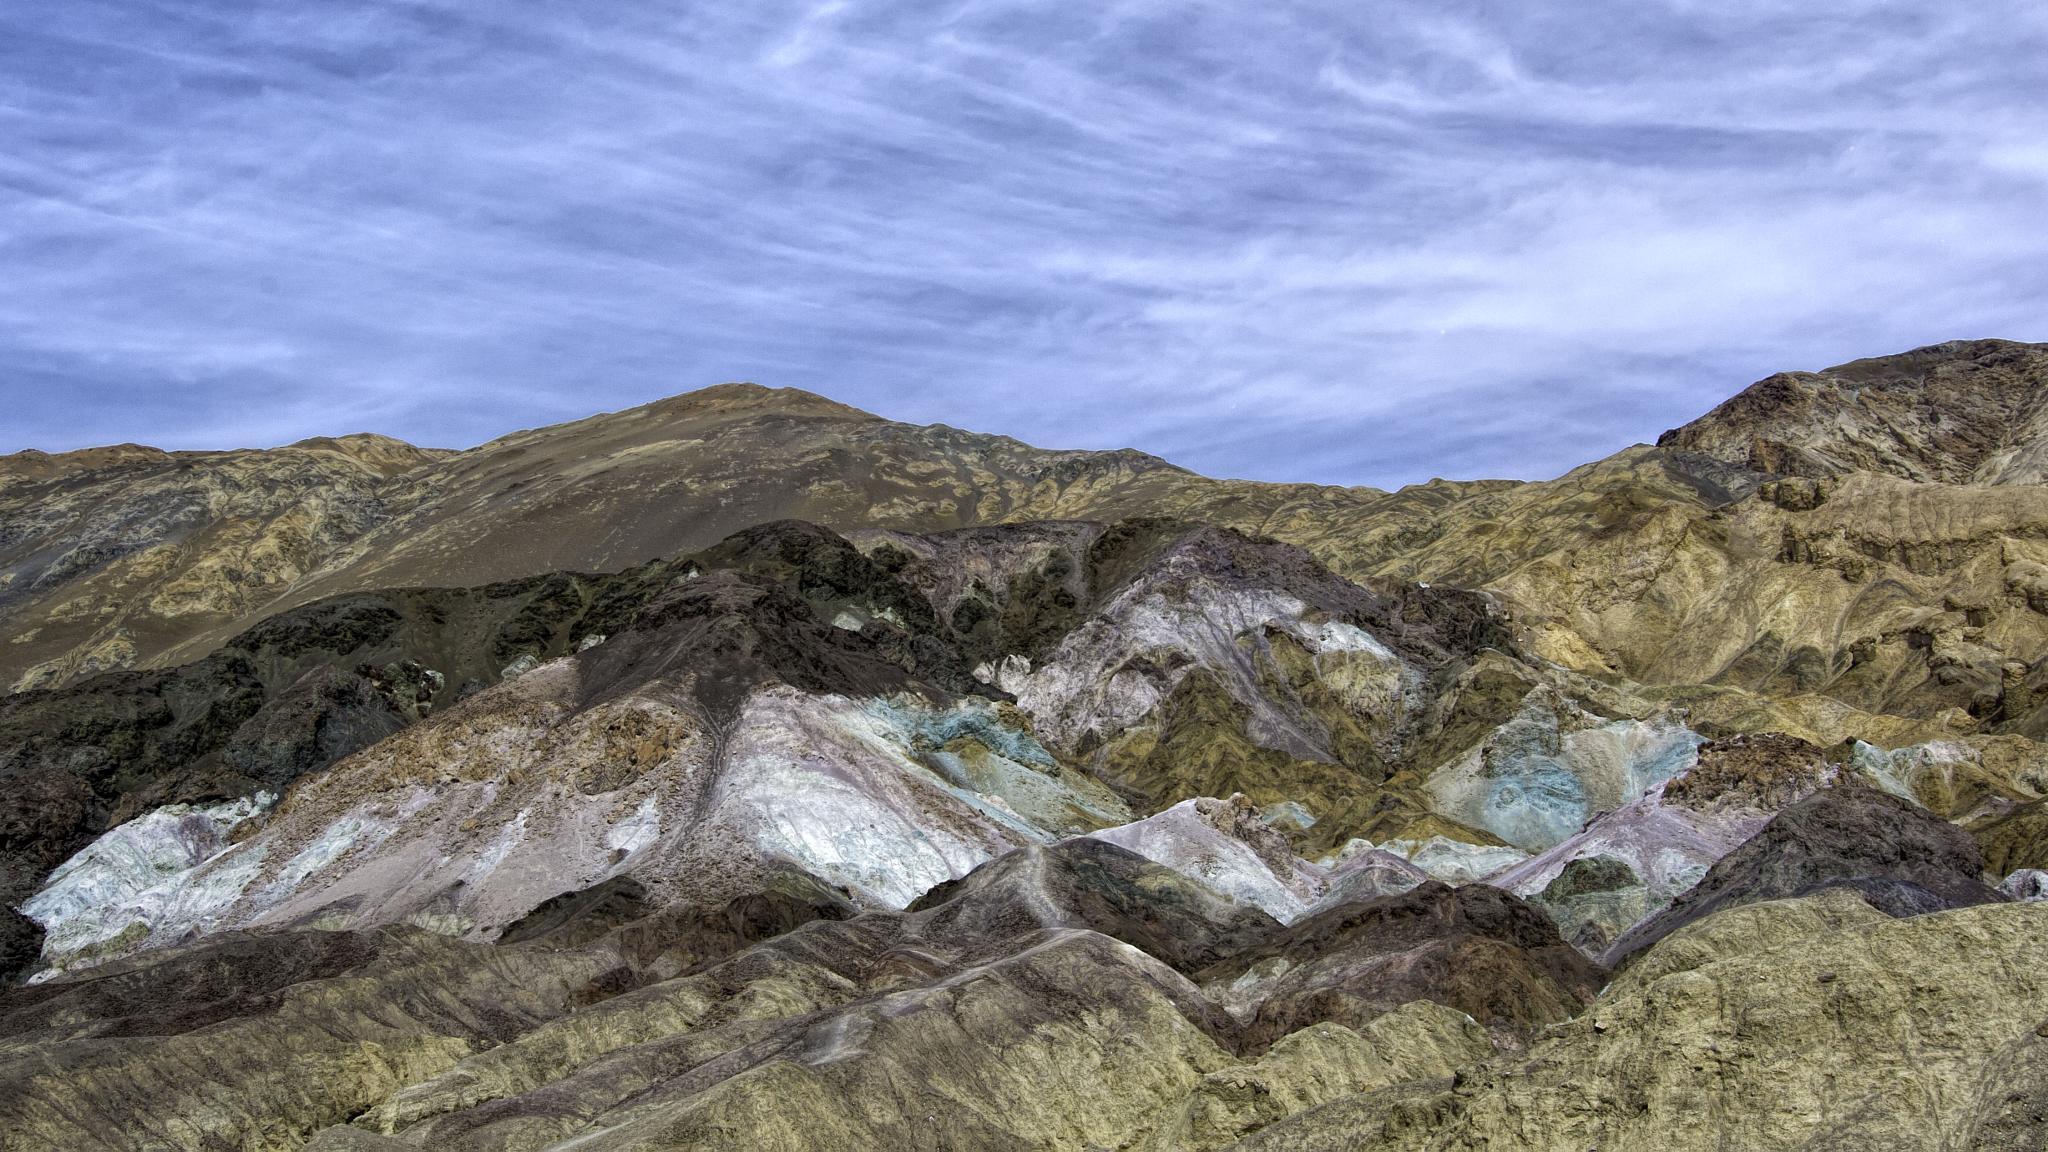 Artist's Palette, Death Valley National Park, CA by steve jordan